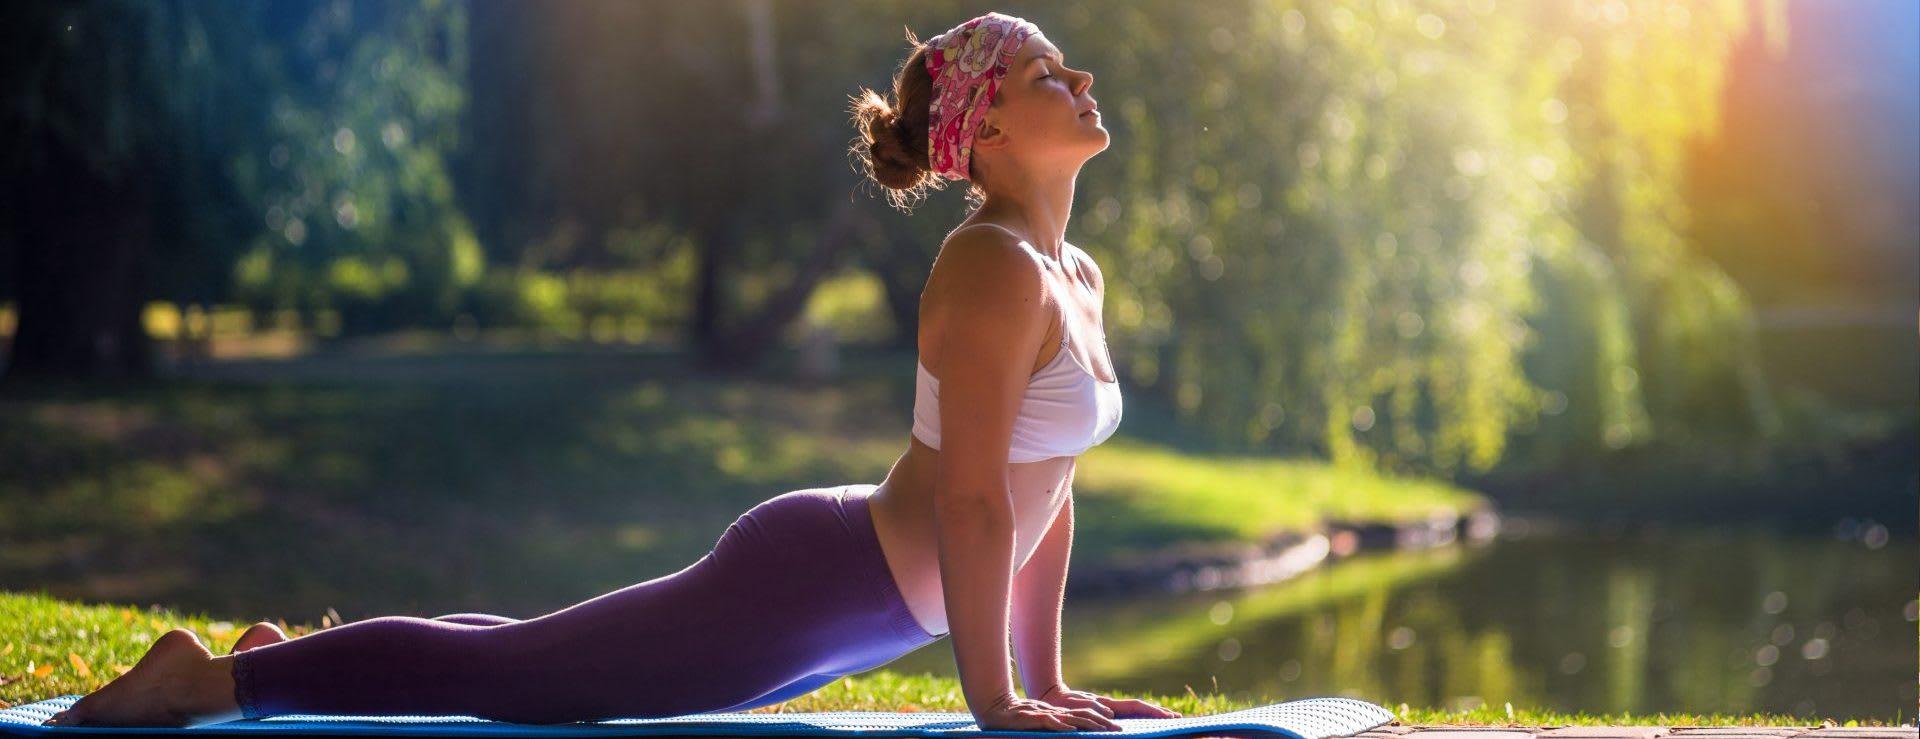 yogisan categorie yoga